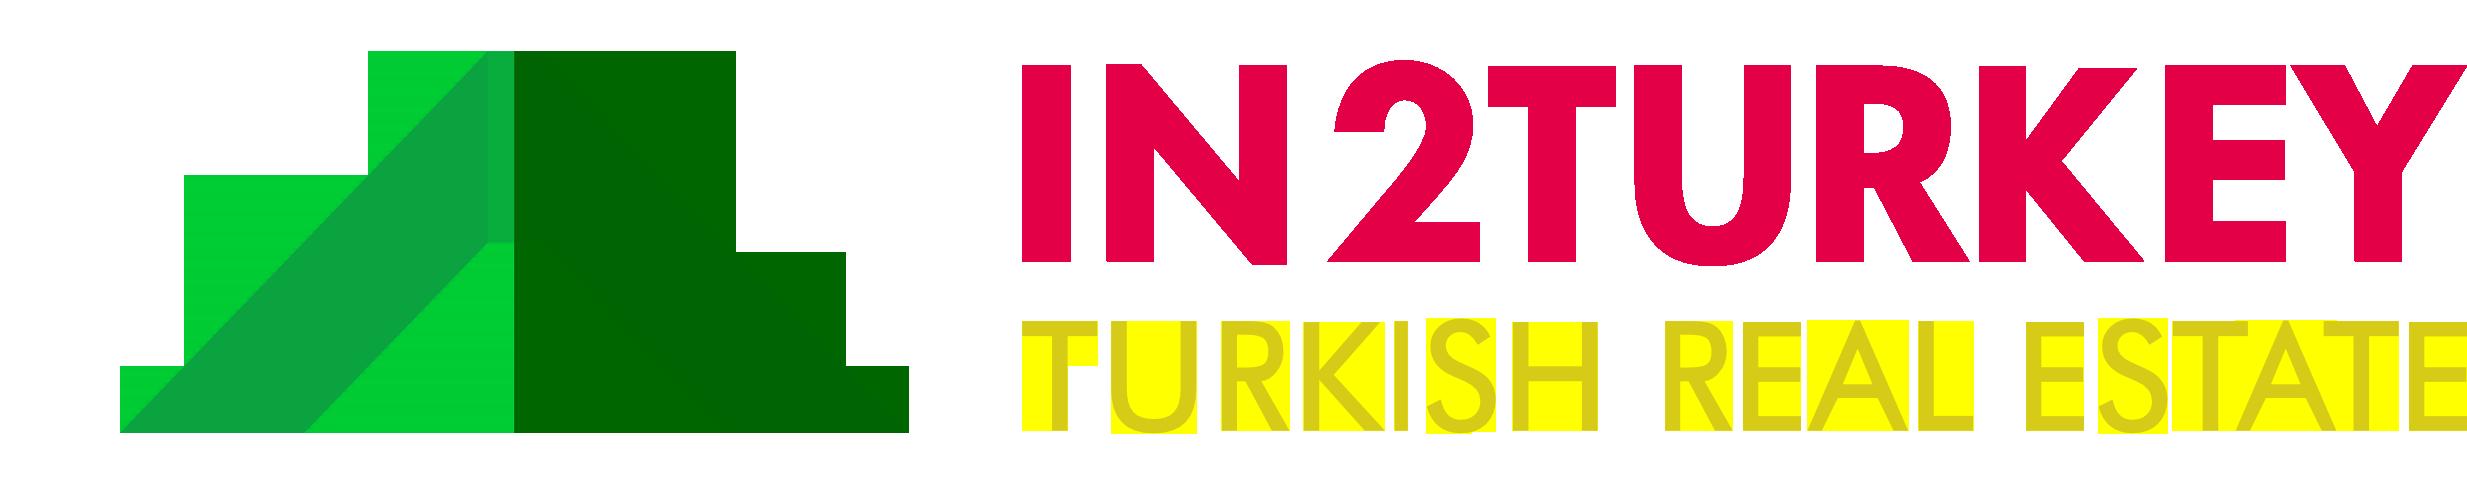 in2turkey – Real estate in Turkey